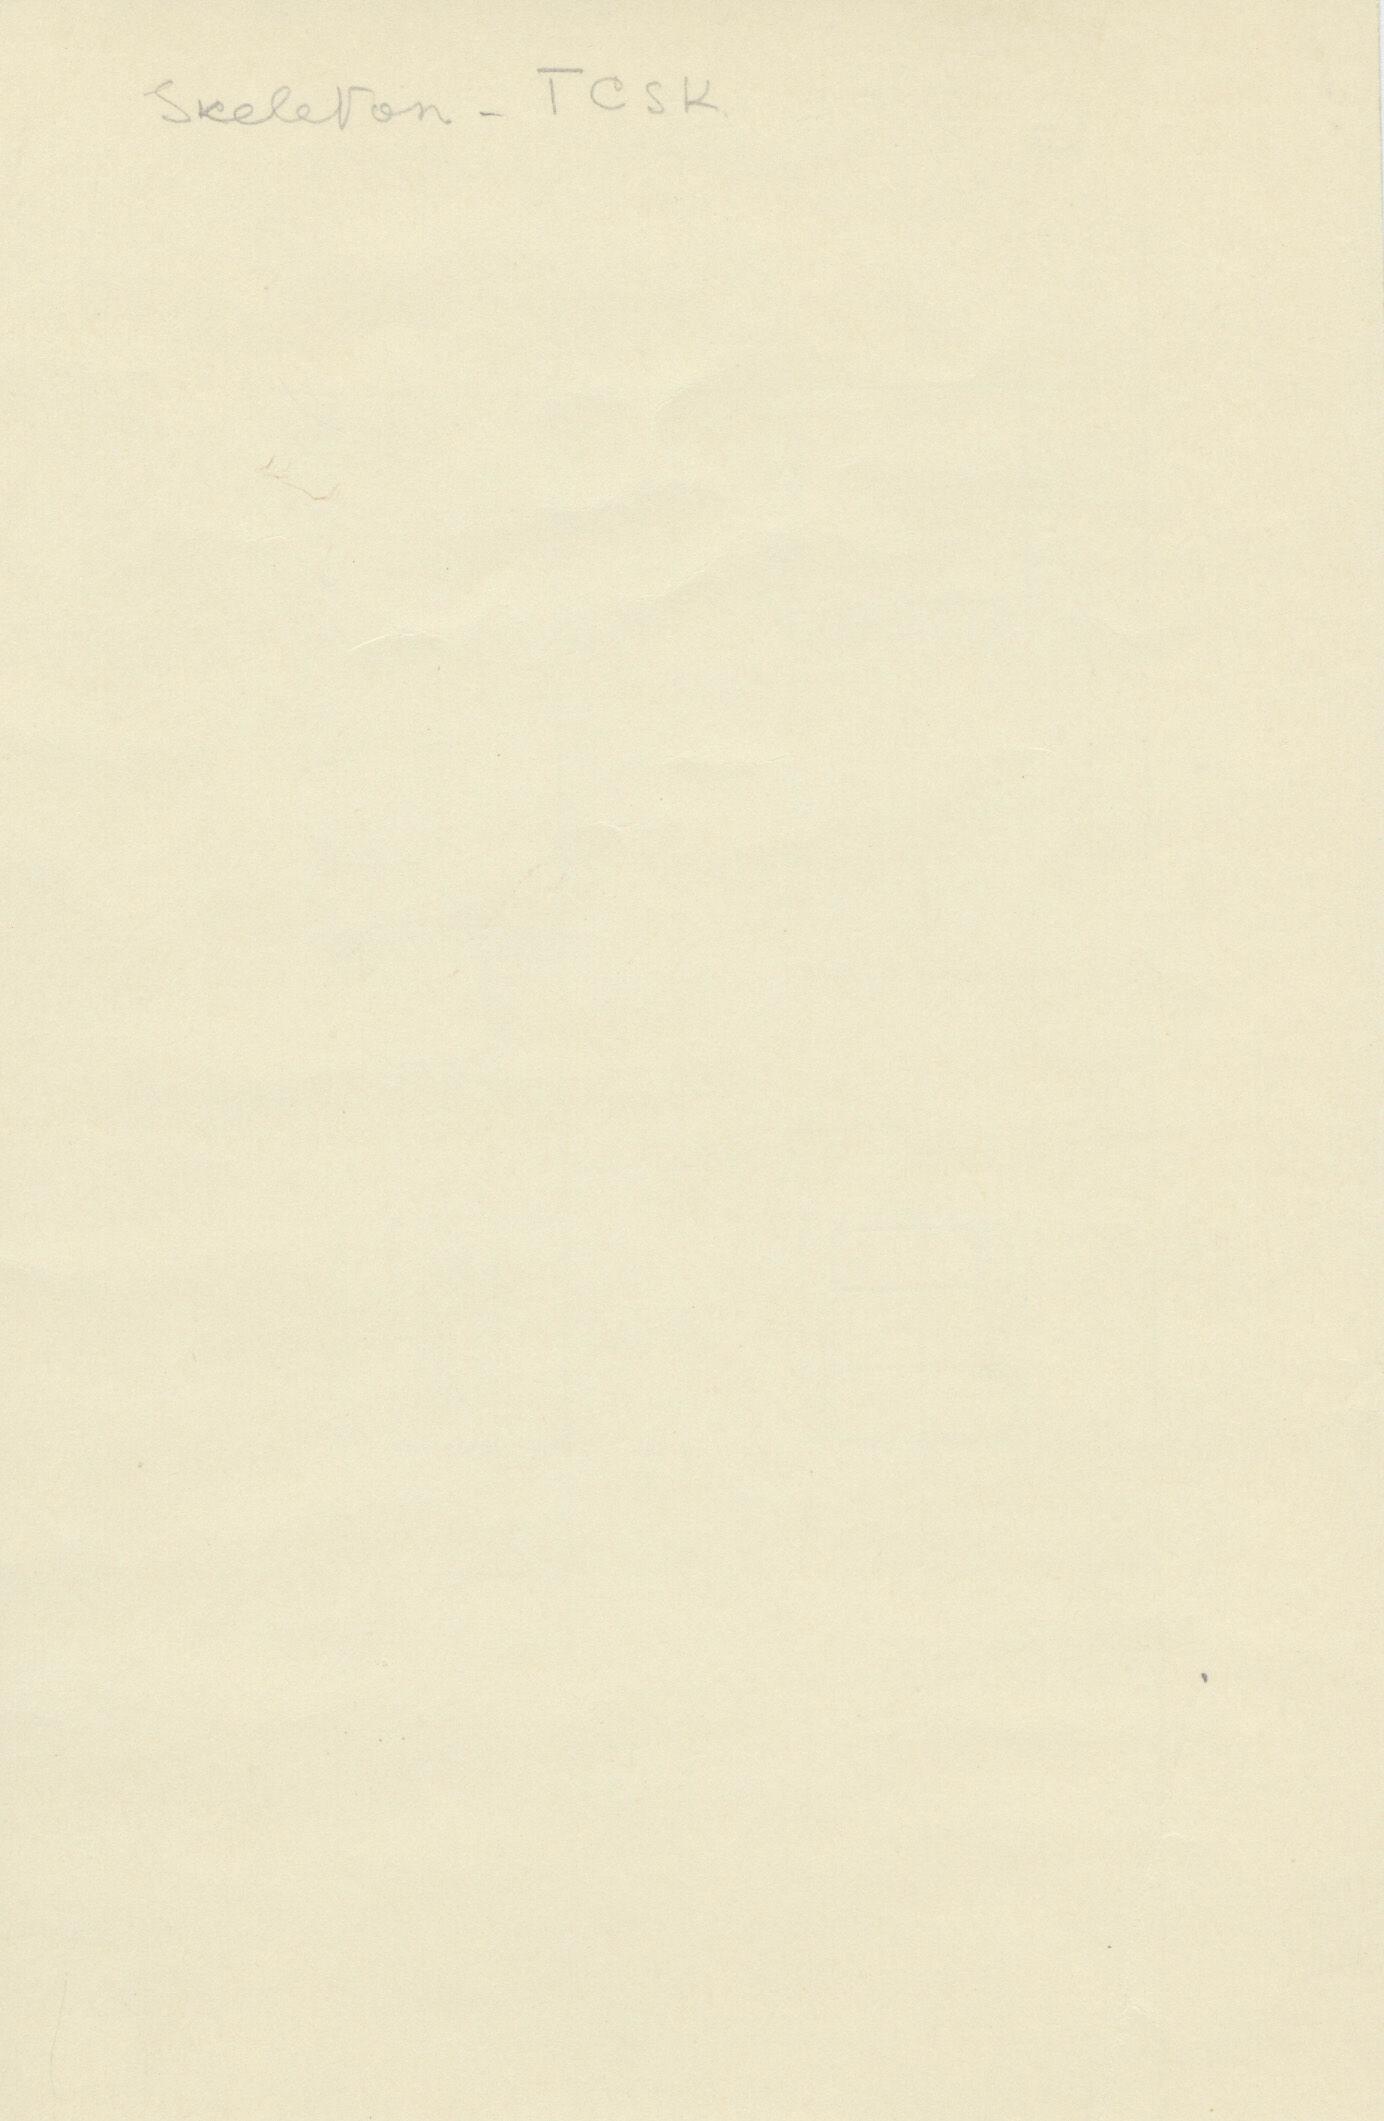 Notes: G 2196, Shaft H (I), notes